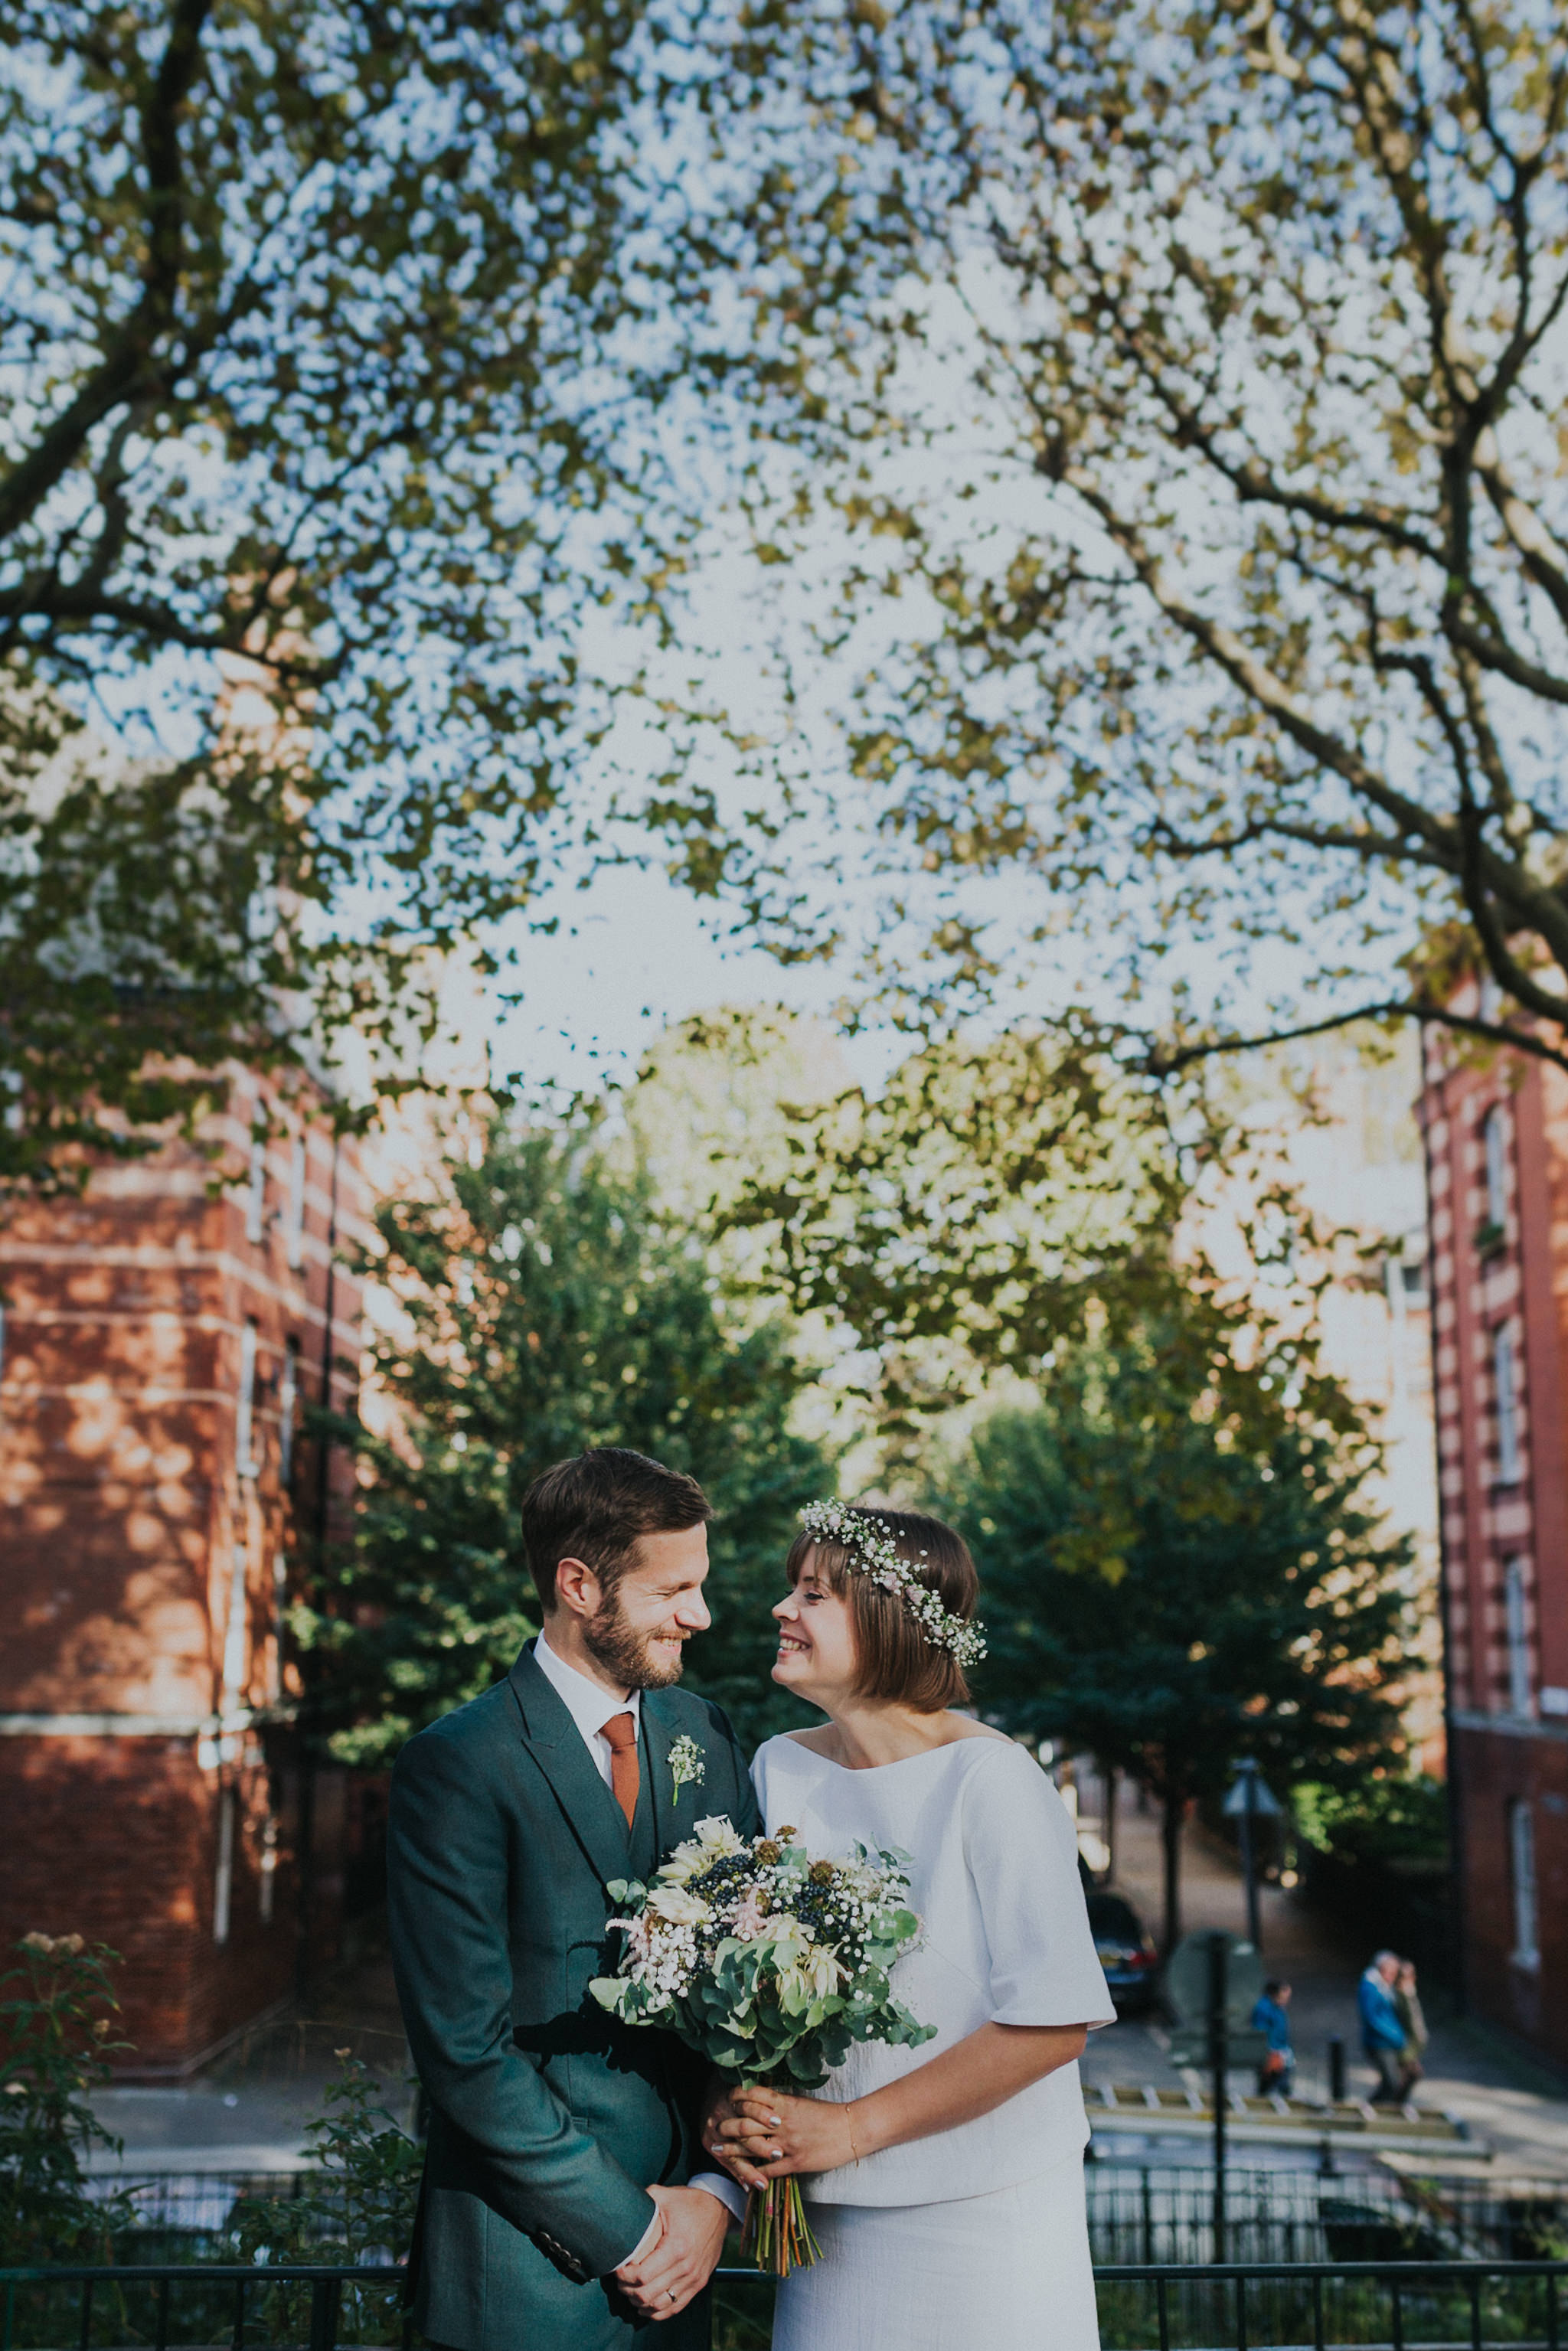 kate-gray-london-wedding-photography-50.jpg